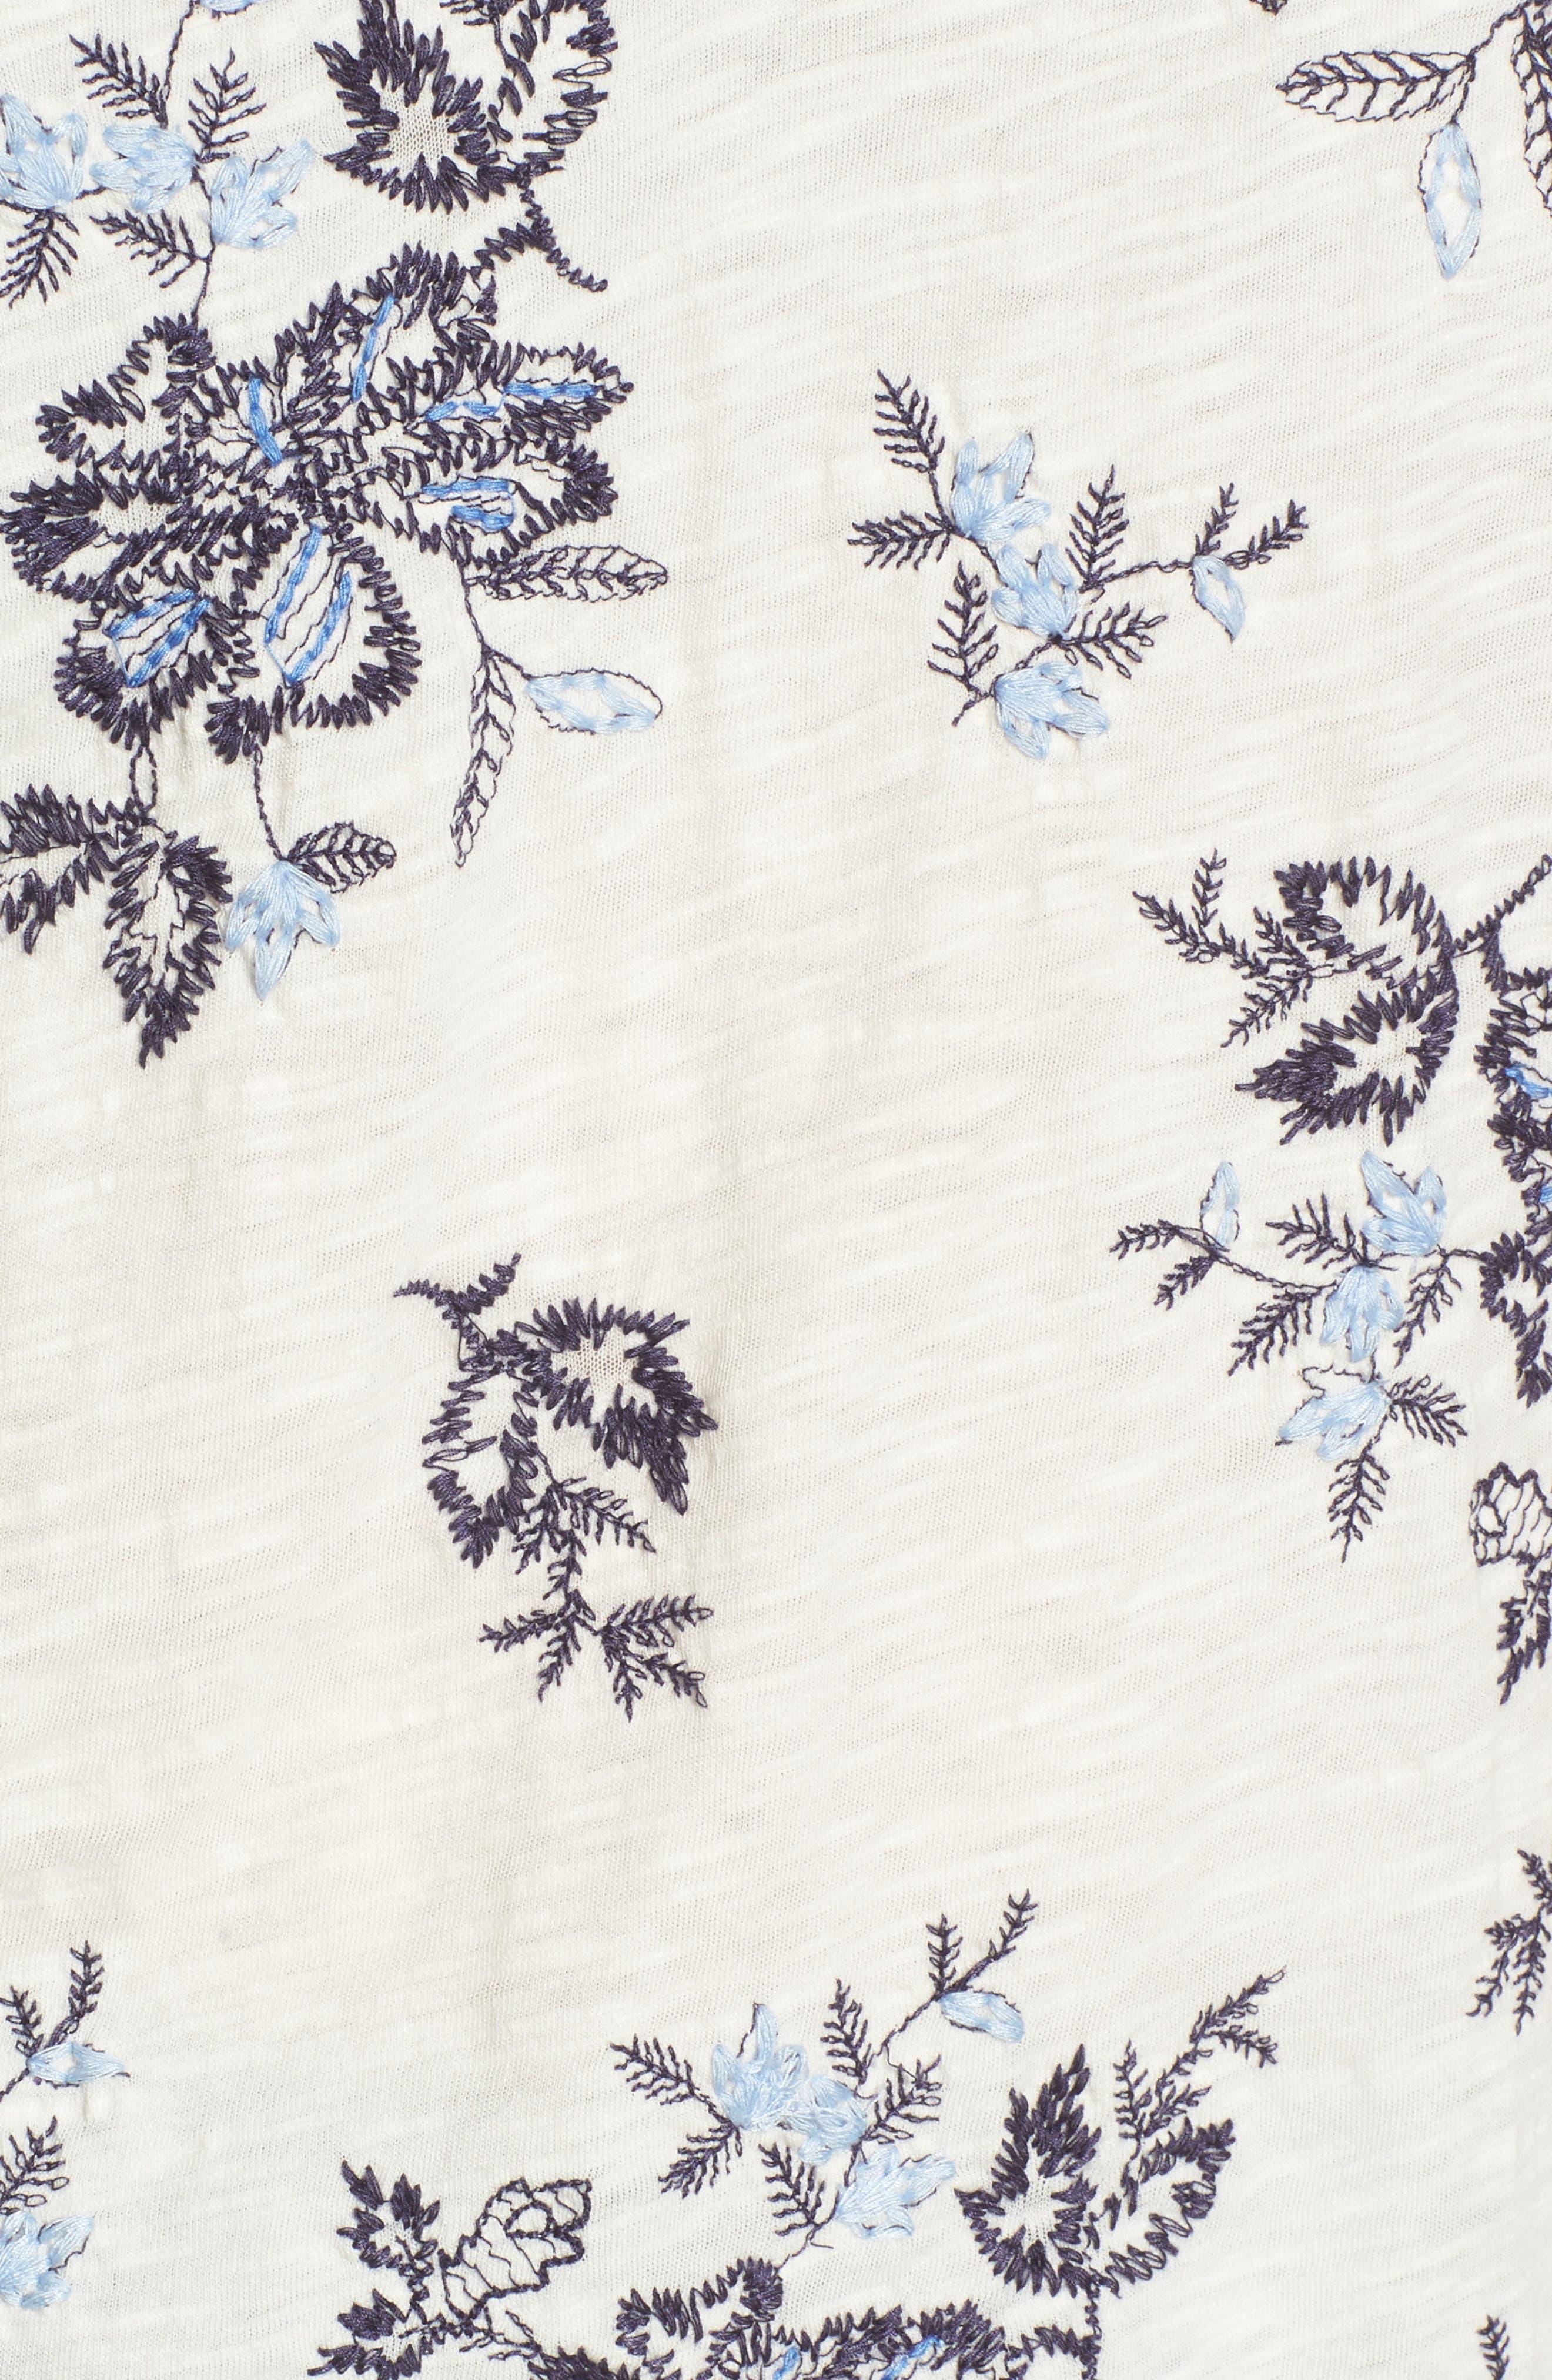 Floral Embroidered Cold Shoulder Top,                             Alternate thumbnail 5, color,                             460